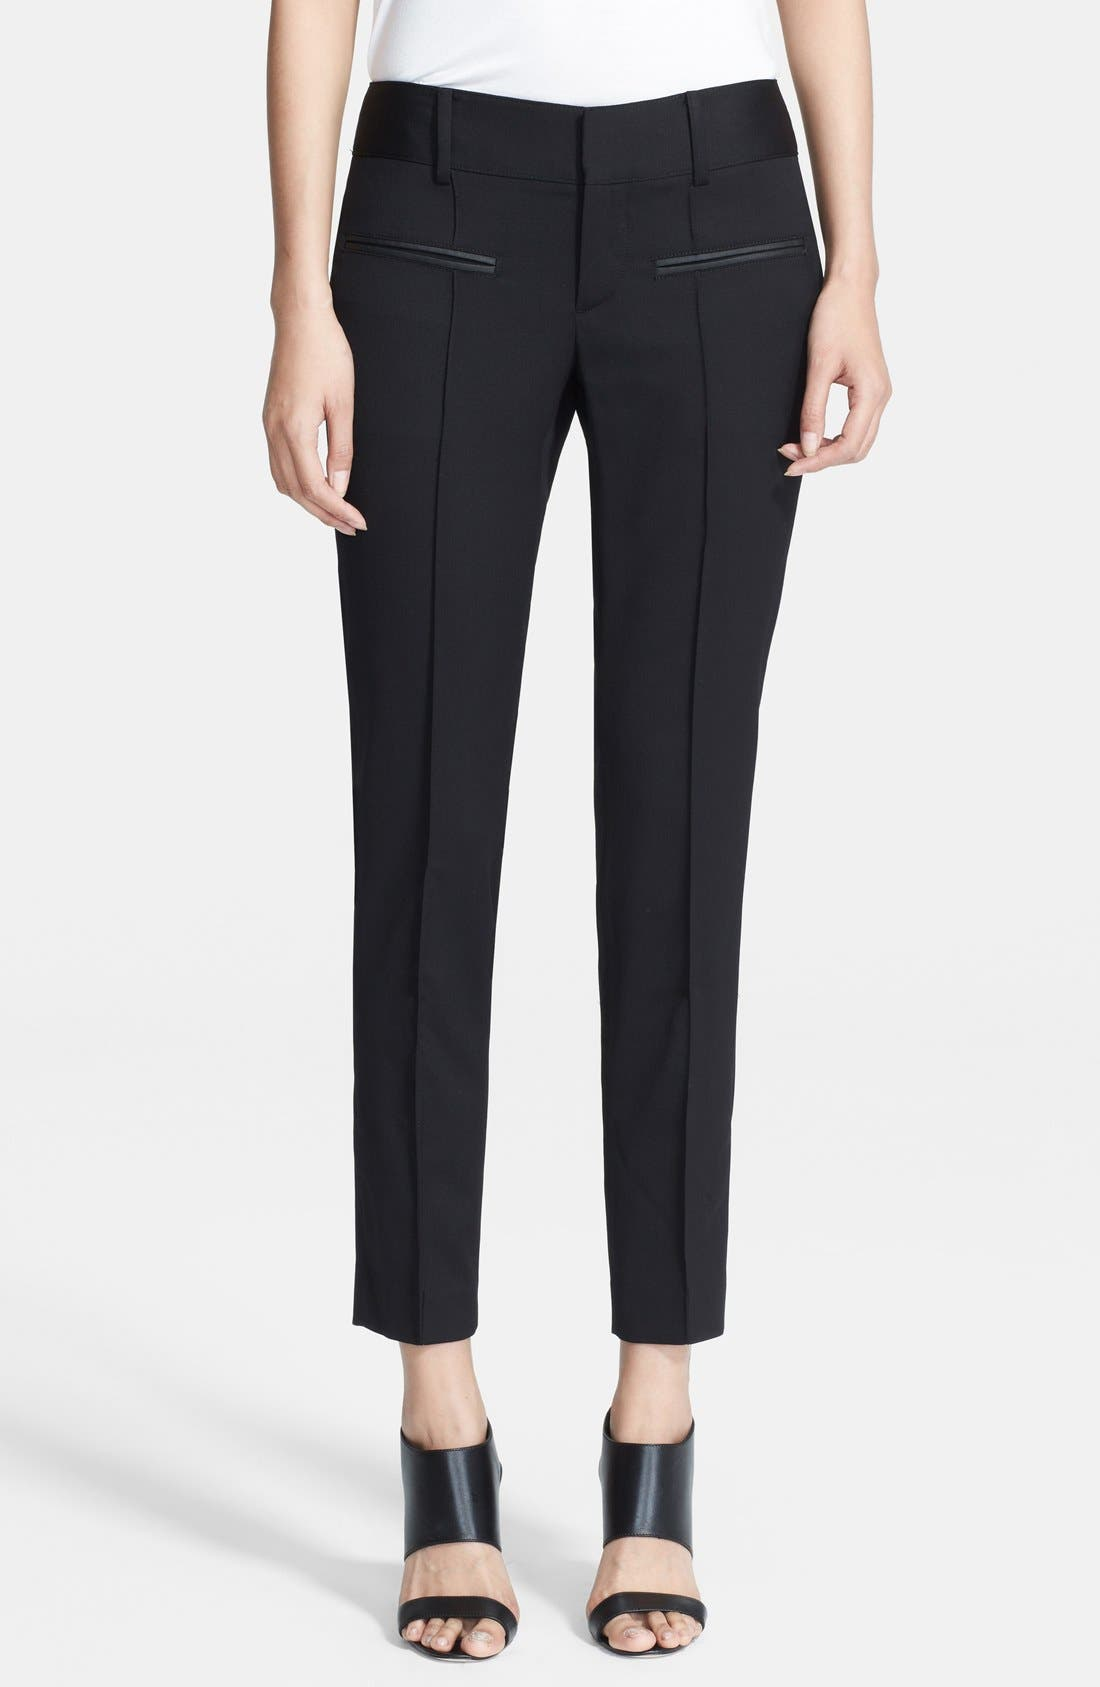 HELMUT LANG Stretch Wool Ankle Pants, Main, color, BLACK